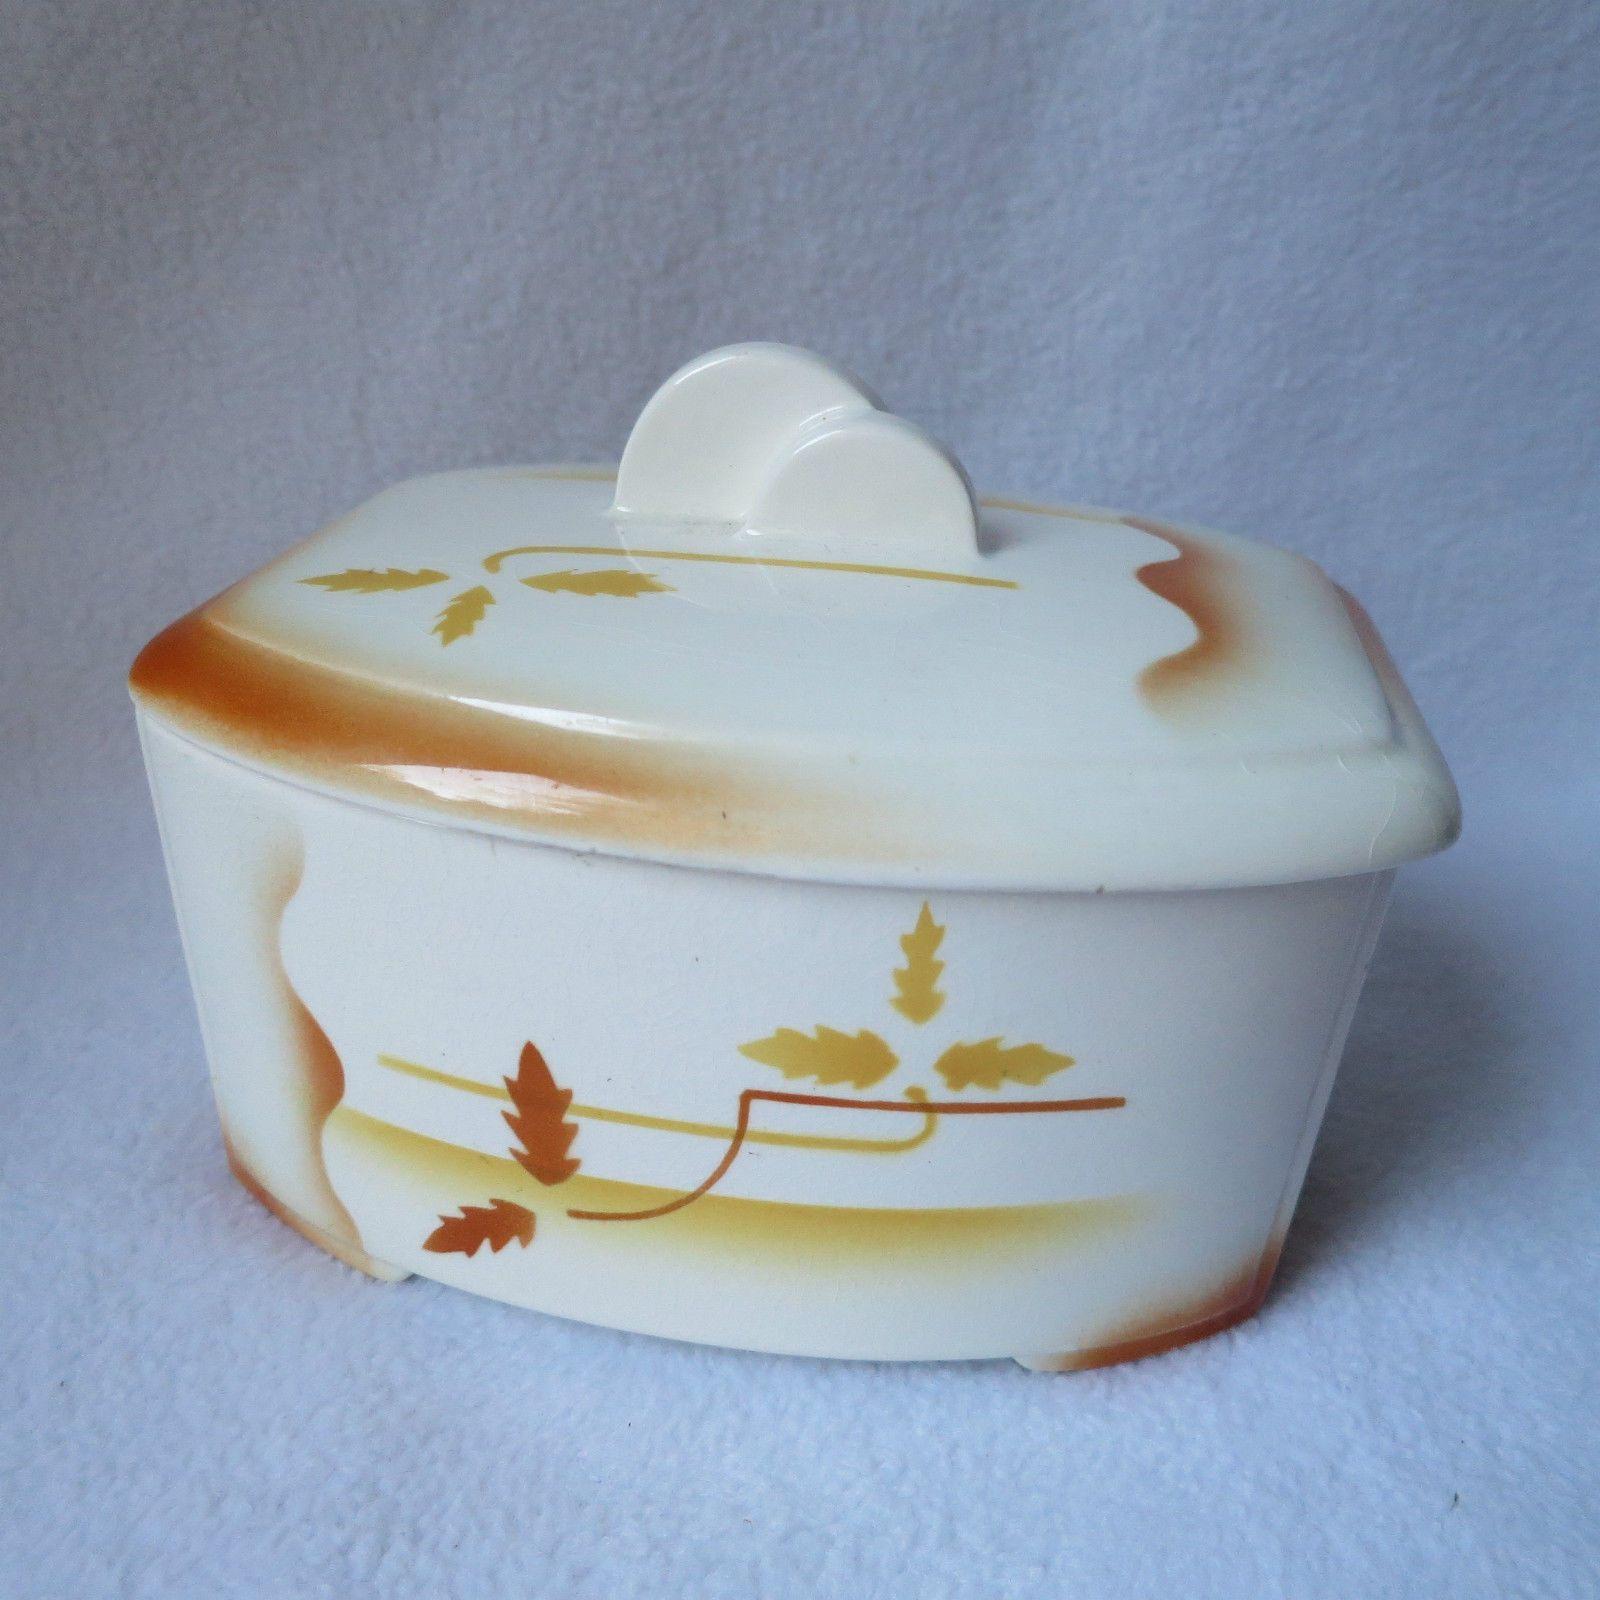 max roesler alte keramik deckeldose keramikdose dose mit deckel spritzdekor rar ceramiche. Black Bedroom Furniture Sets. Home Design Ideas